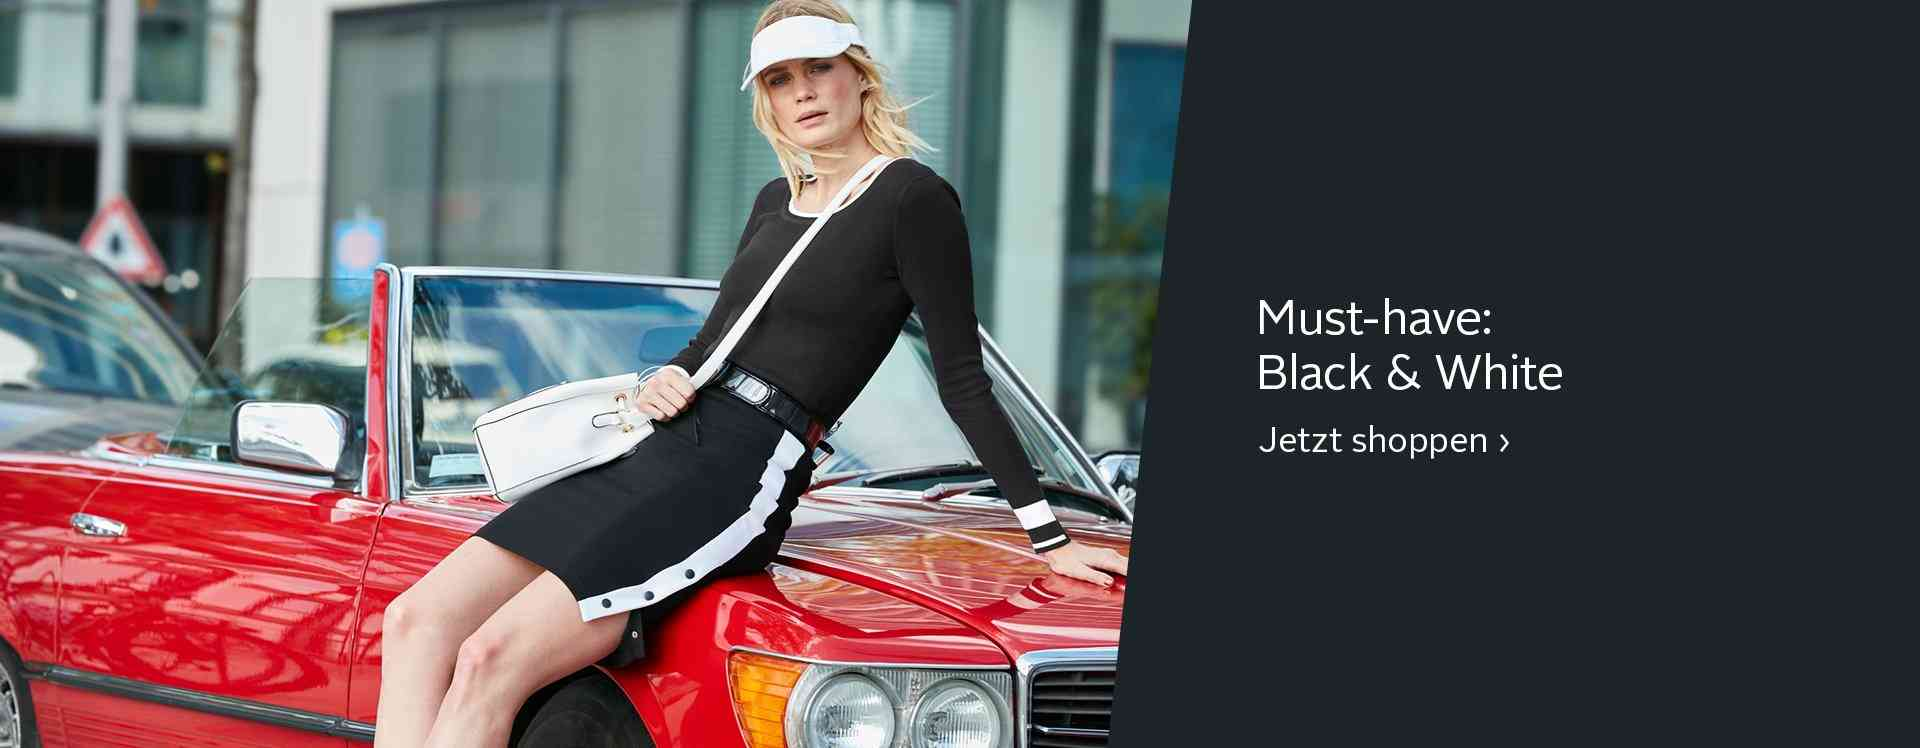 Trend Black & White